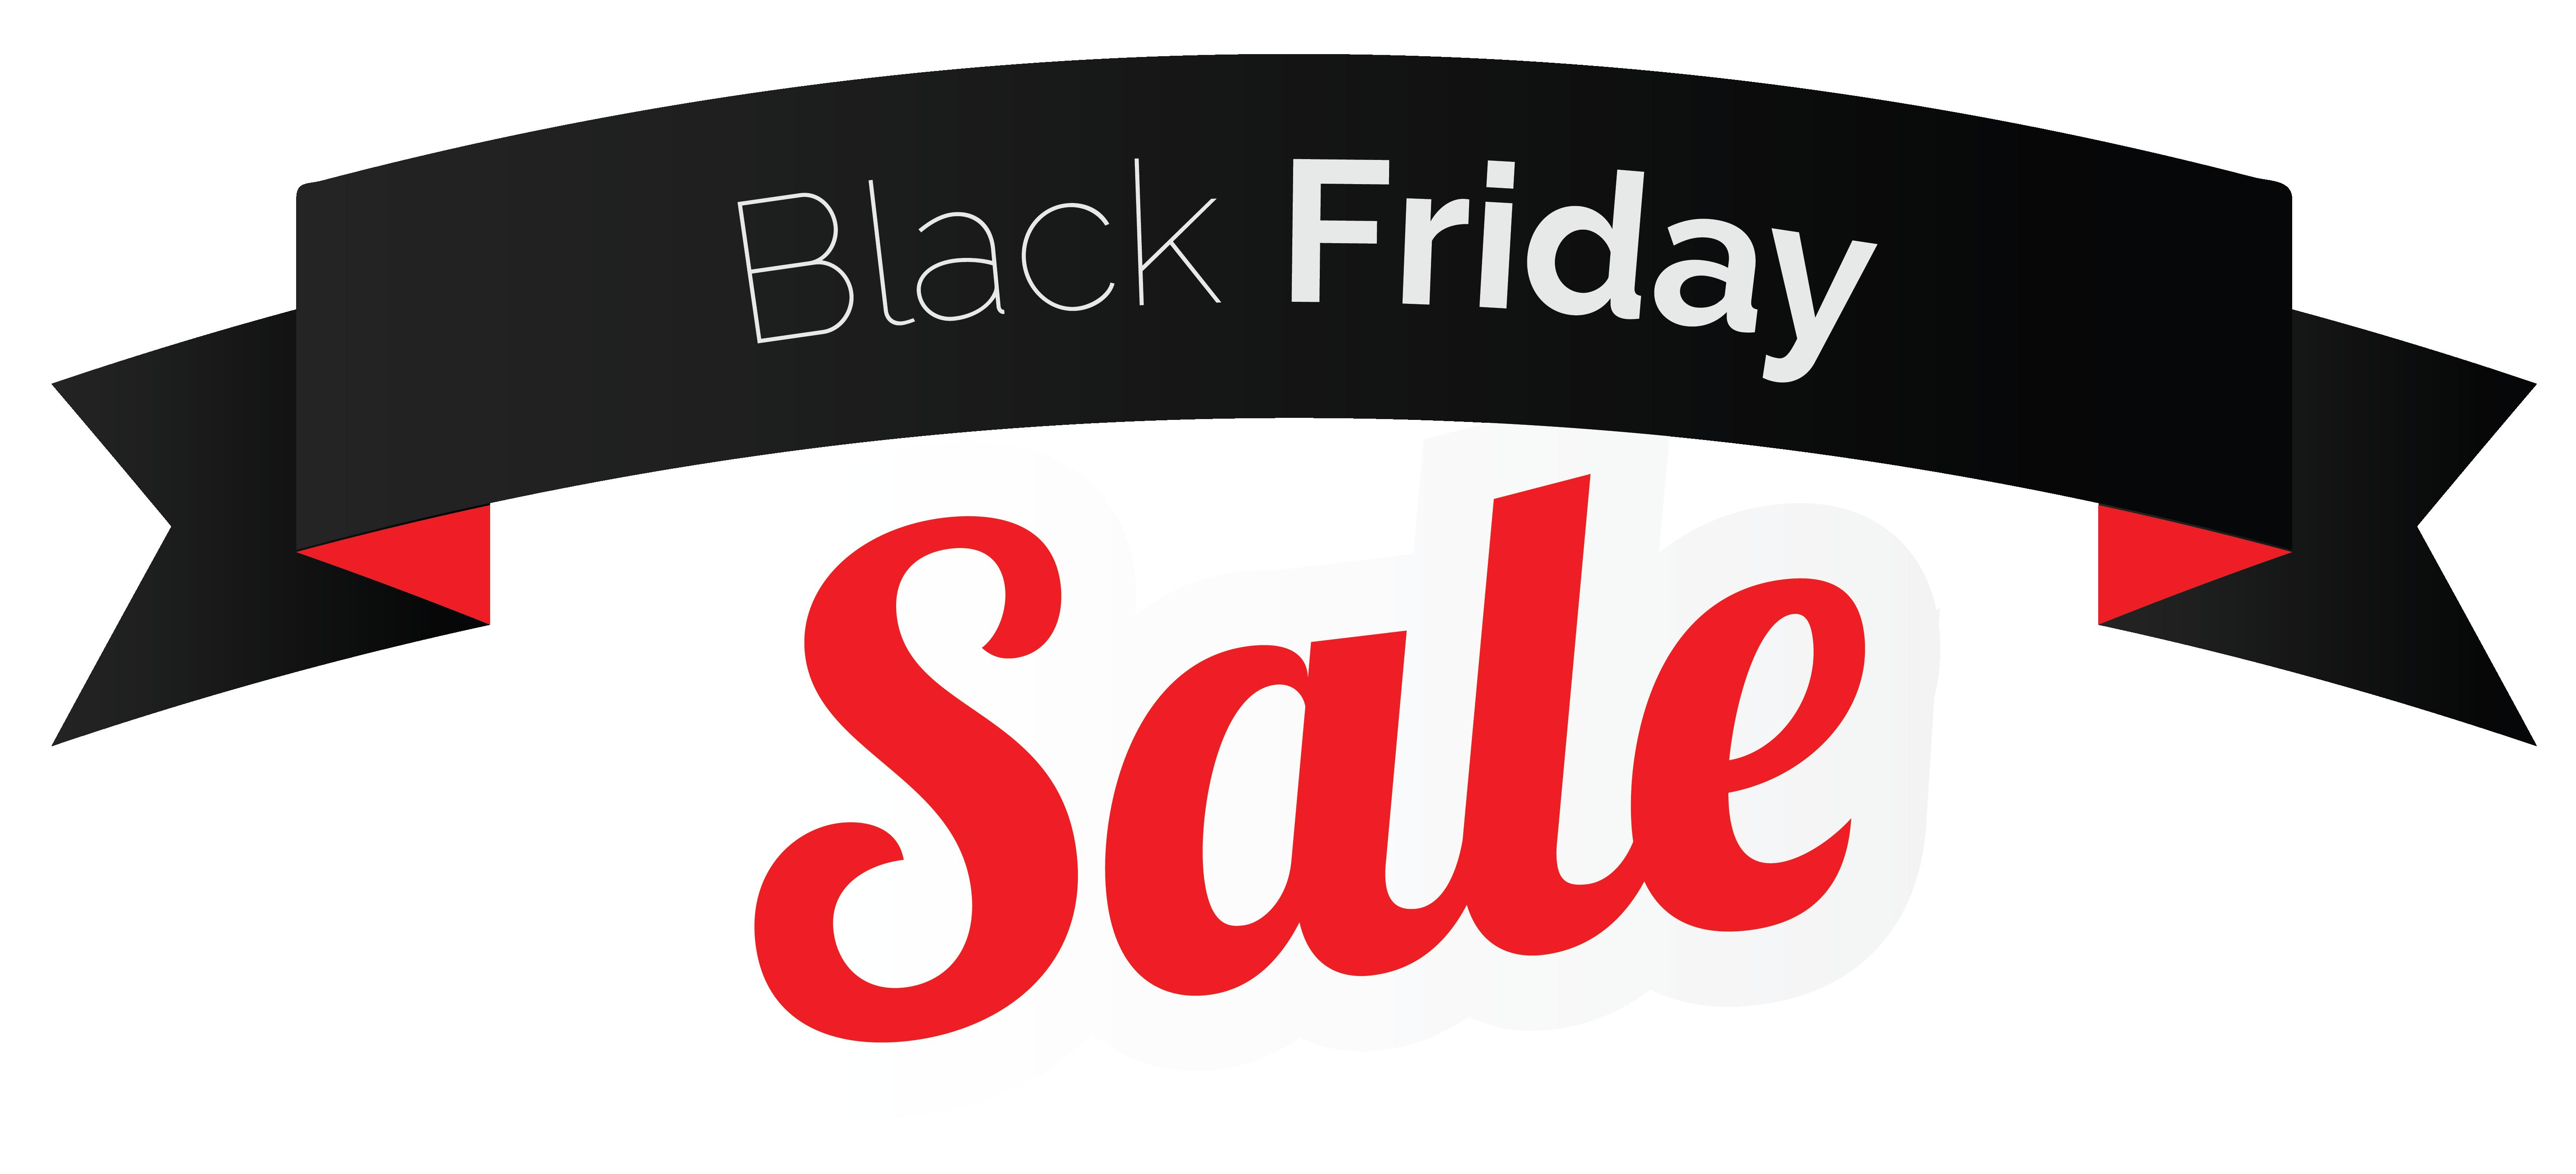 Black friday deals free clipart graphic transparent MonsterMegs Black Friday 2016 Hosting Sale – MonsterMegs Blog graphic transparent